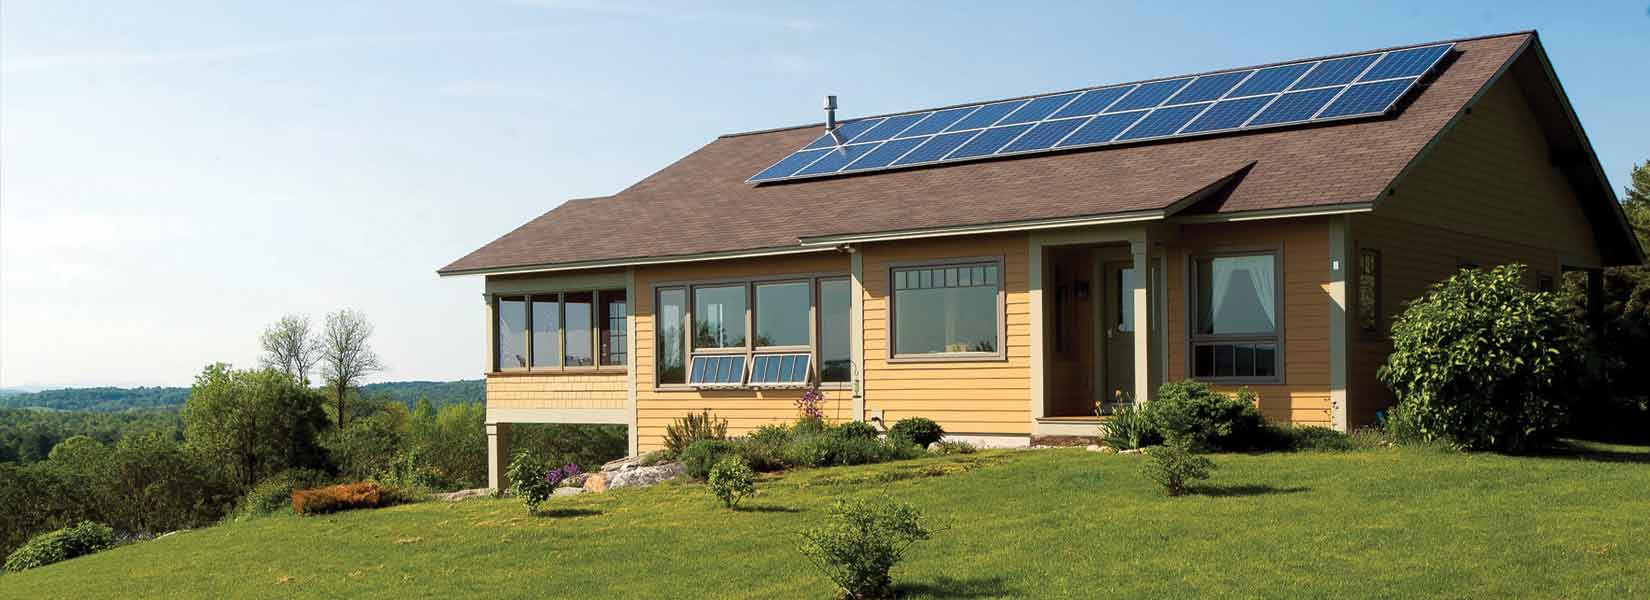 فروش برق خورشیدی ویلا